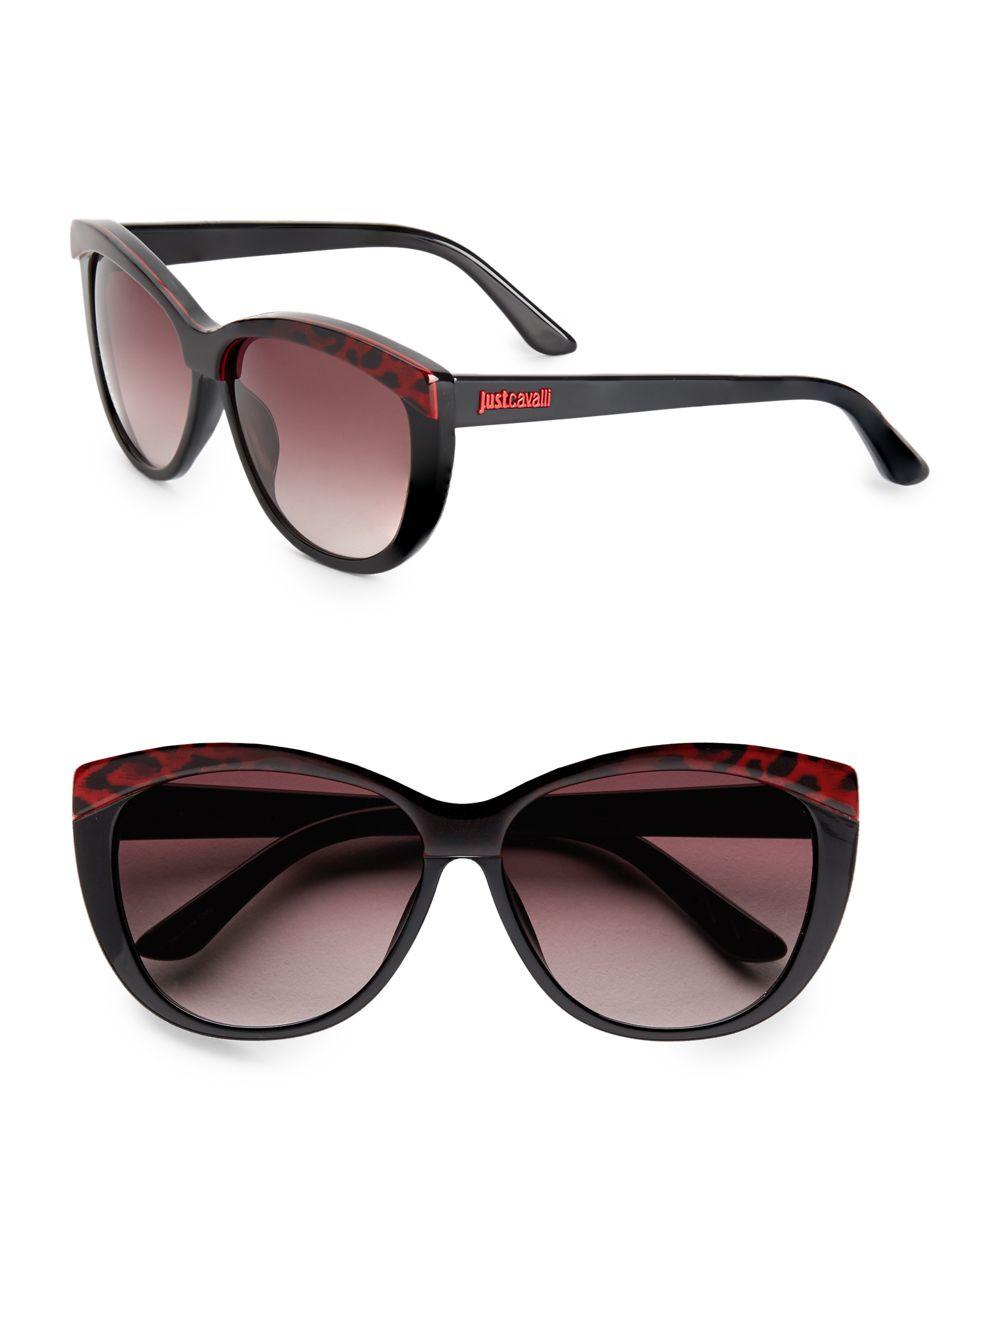 4629501caac Lyst - Just Cavalli 60mm Two-tone Cat s-eye Sunglasses in Black